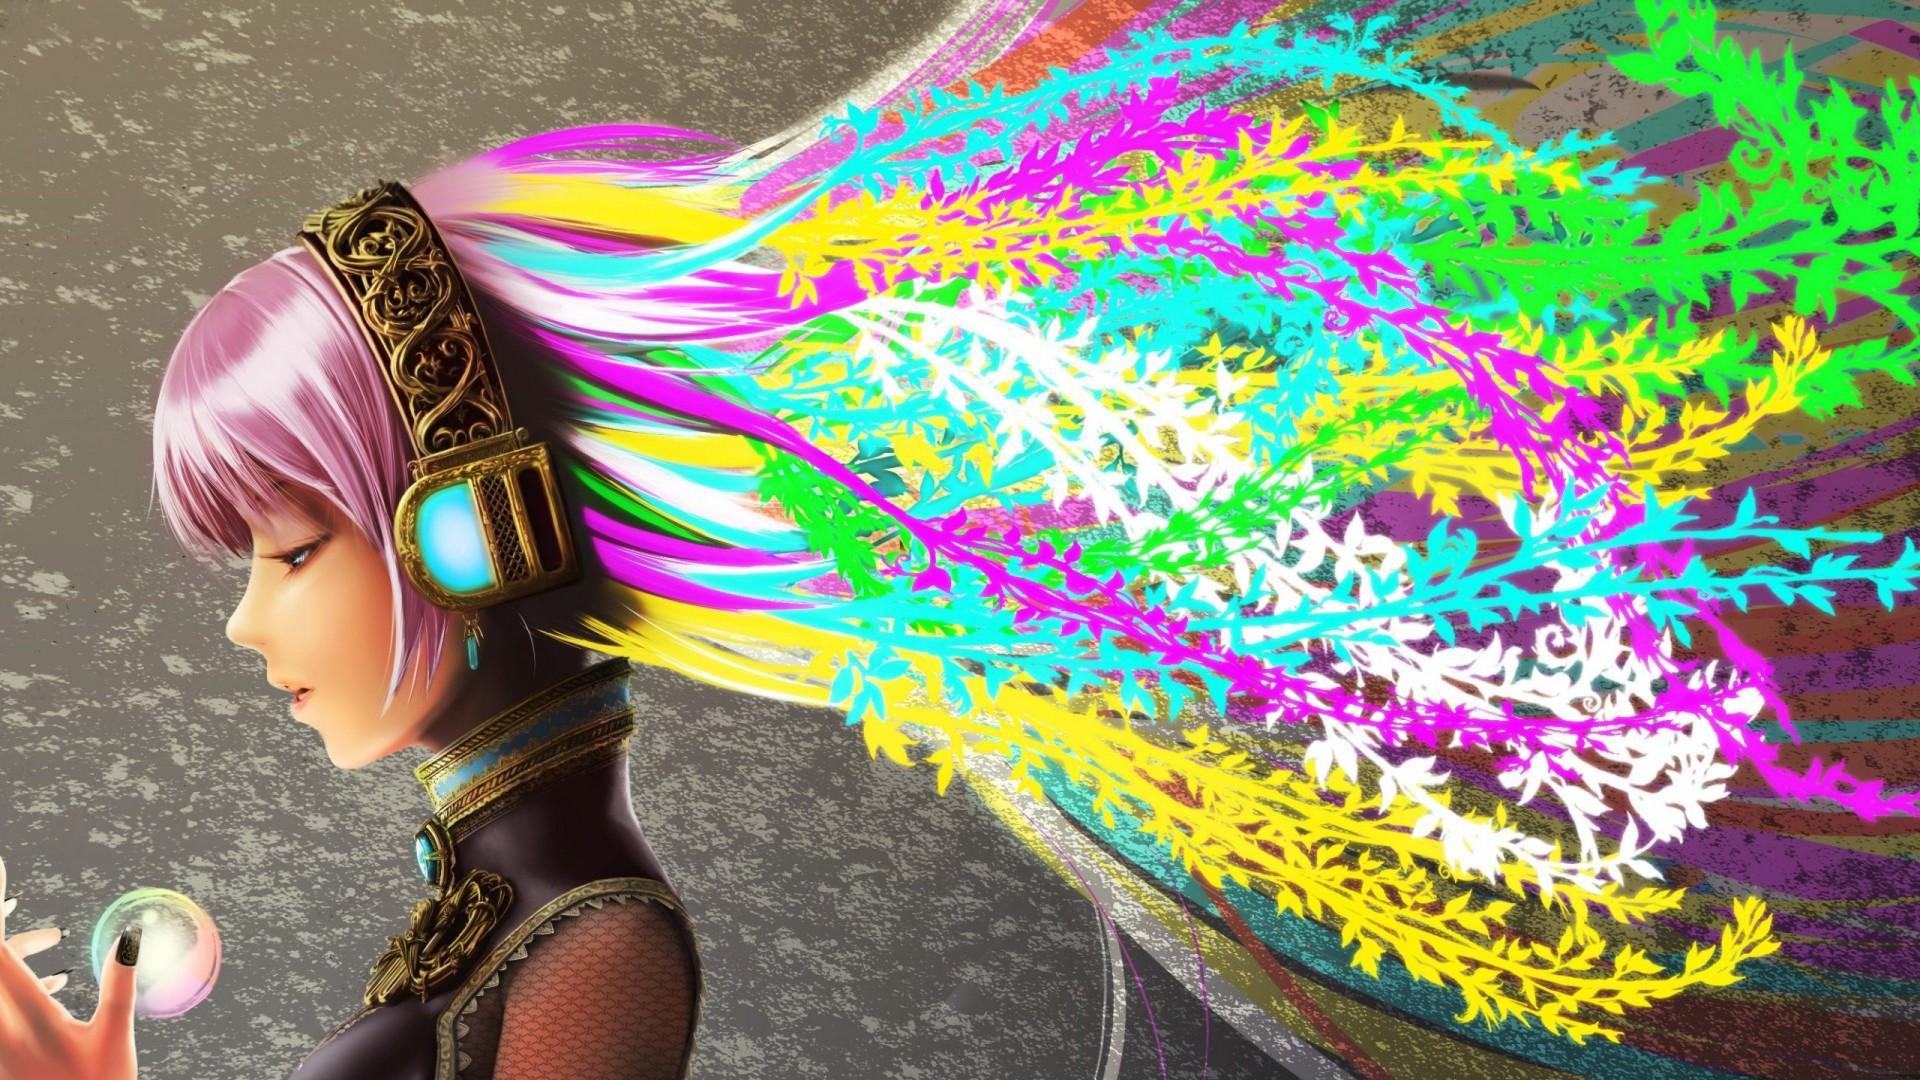 Headphones Vocaloid Multicolor Wallpaper